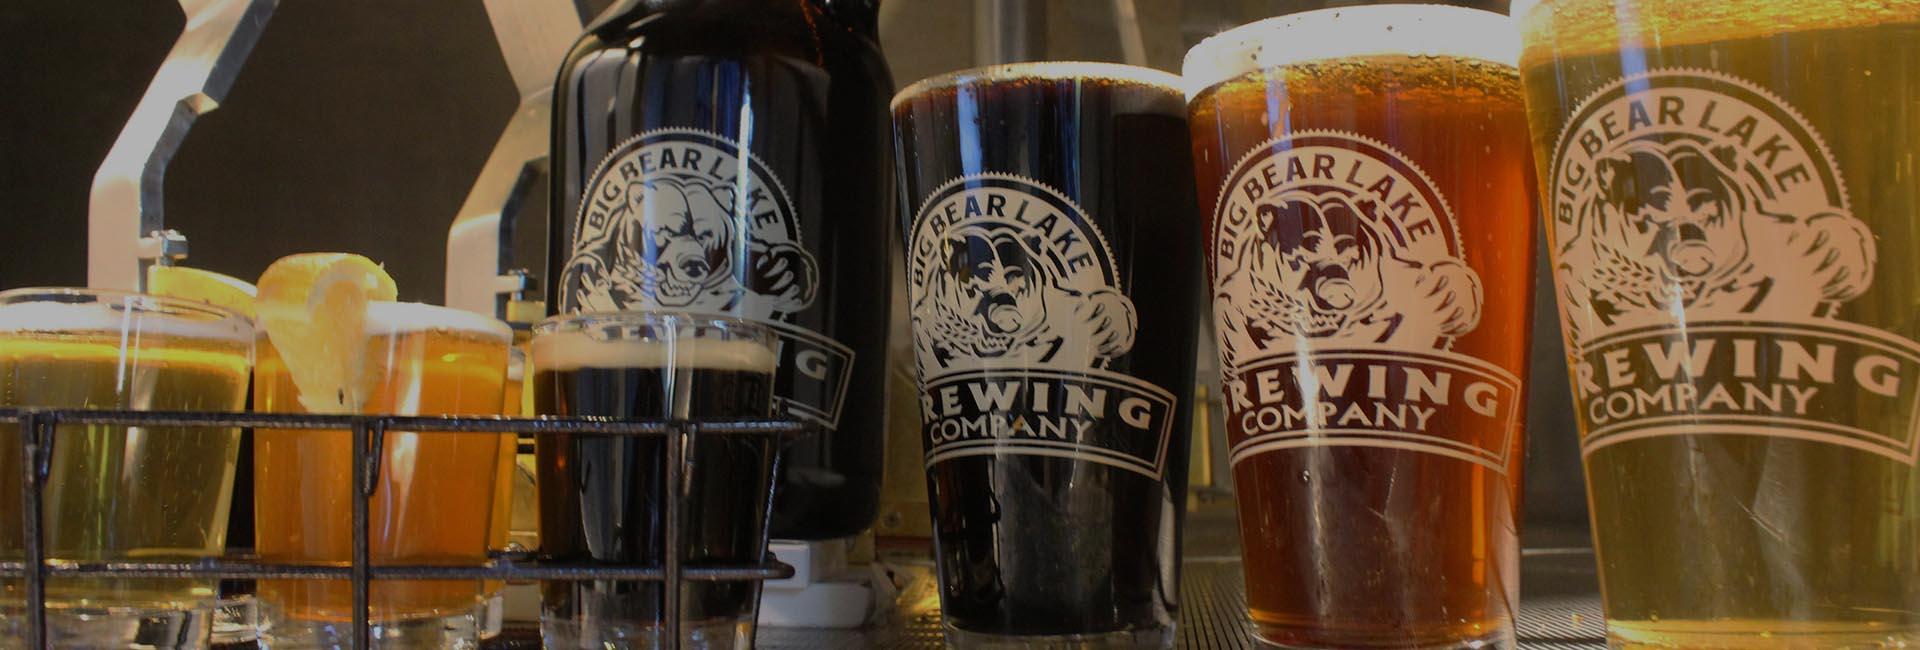 Big Bear Lake Brewing Company - Beer List